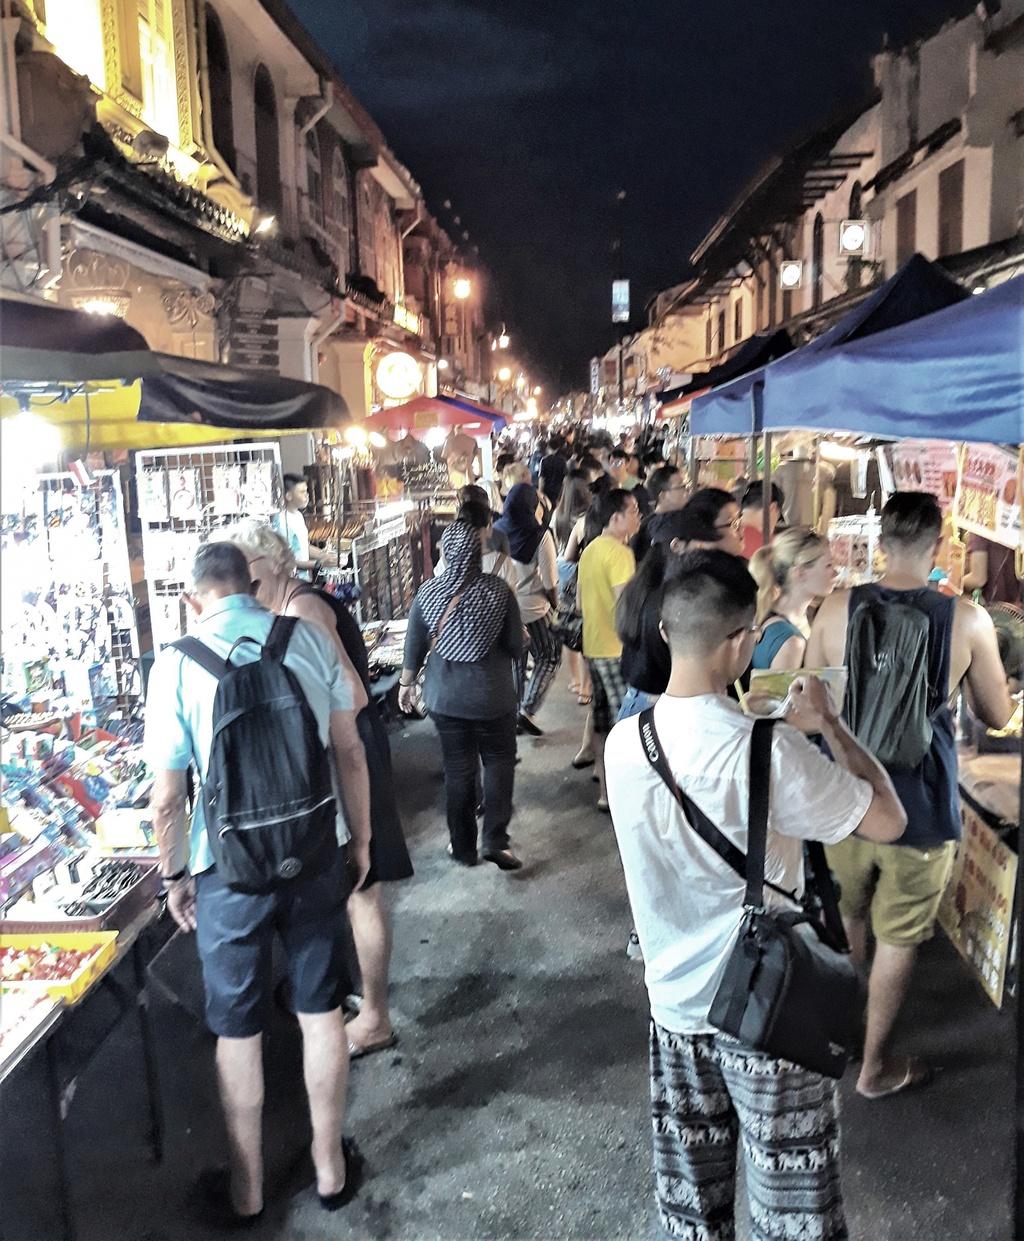 #Mytour: Rao buoc kham pha khong gian co xua cua thanh pho Malacca hinh anh 24